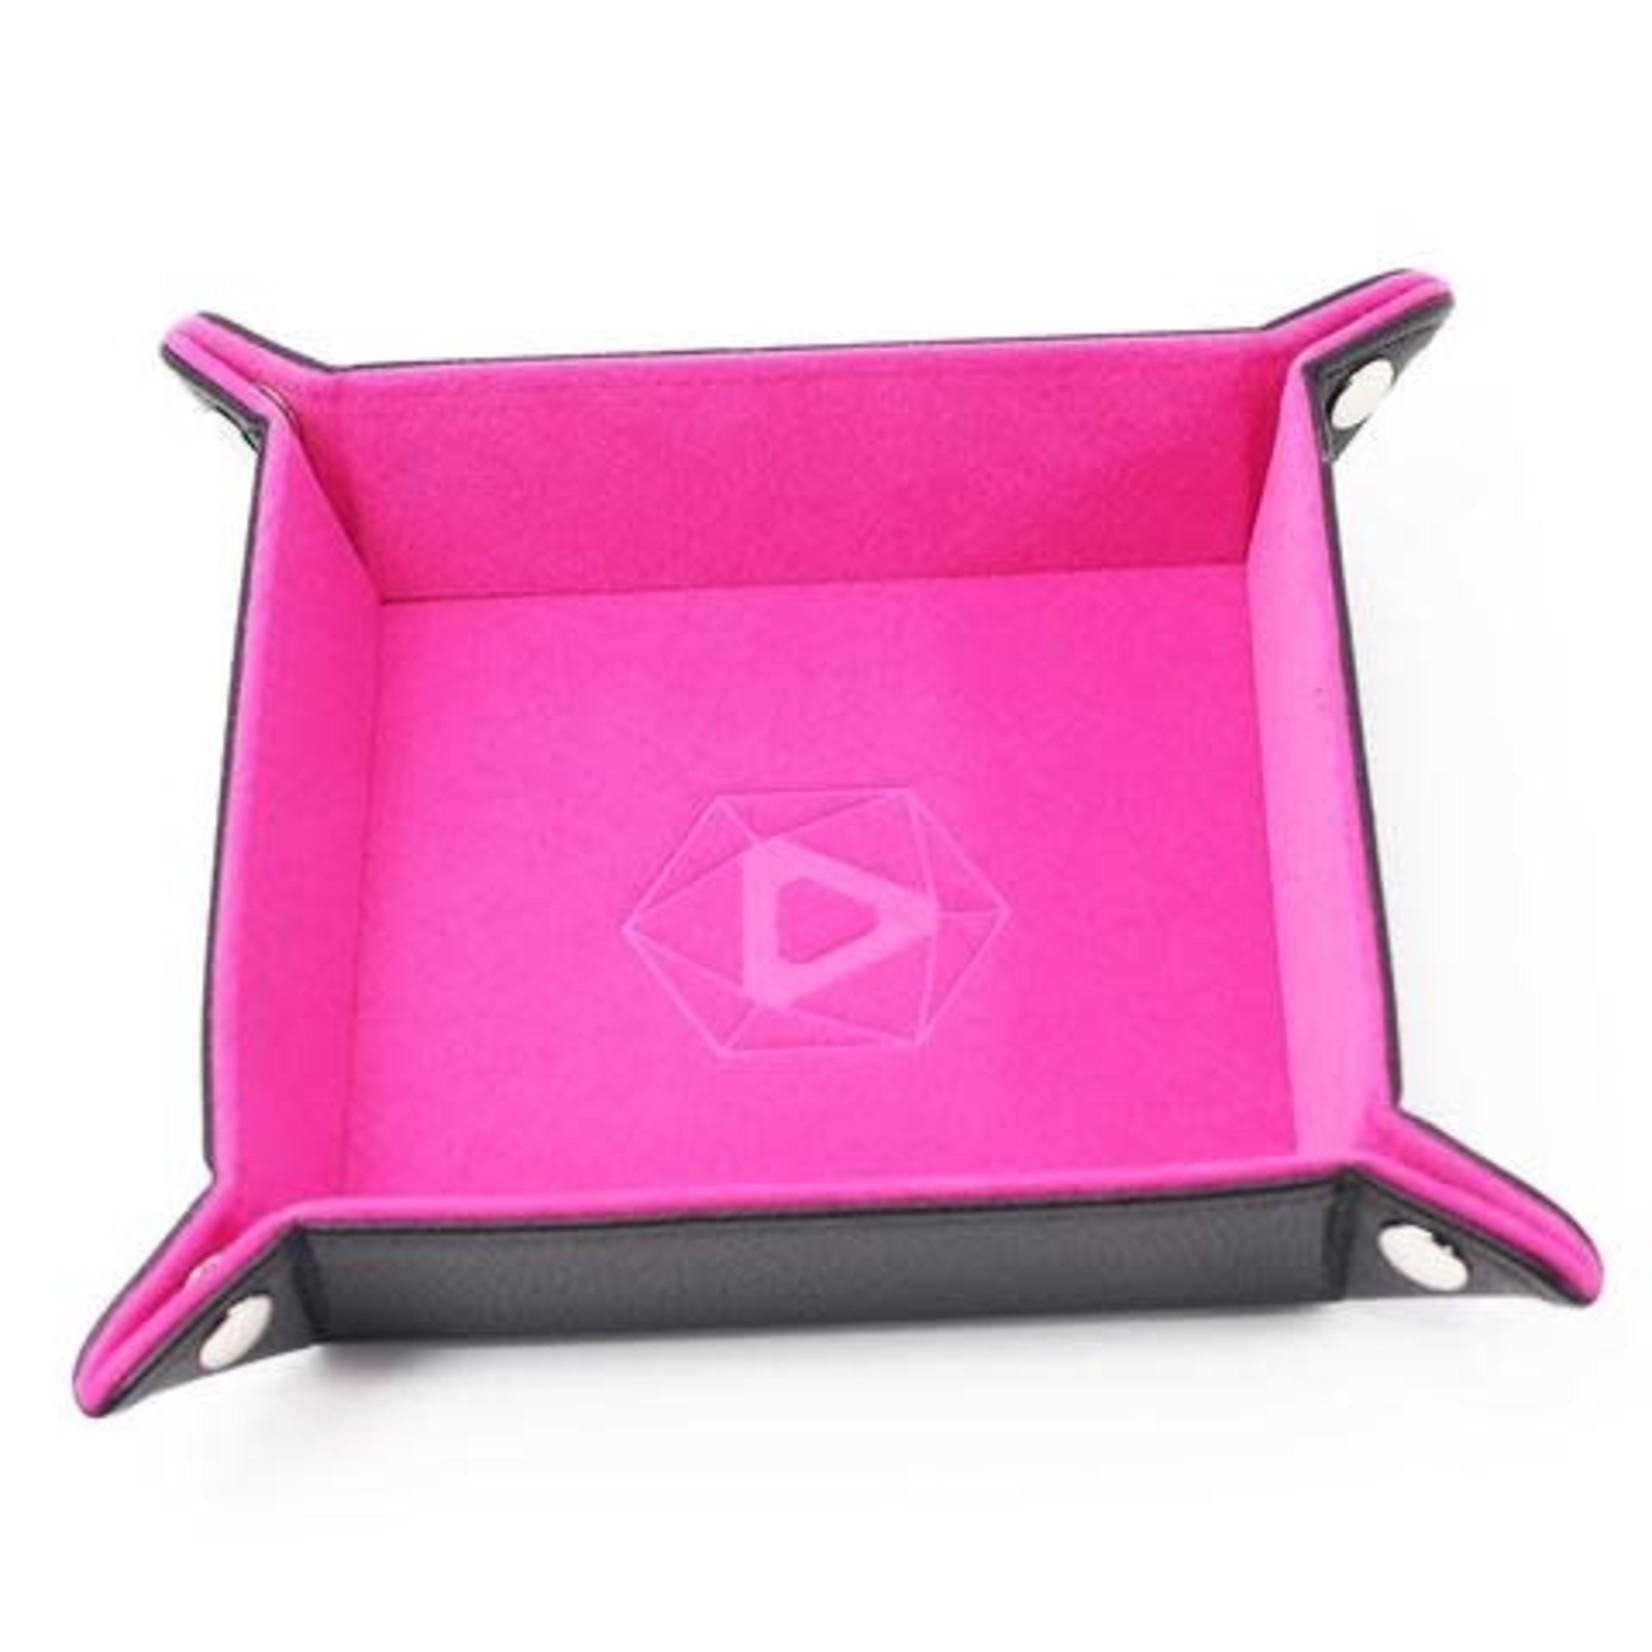 Die Hard Dice Die Hard Dice: Folding Square Dice Tray - Pink